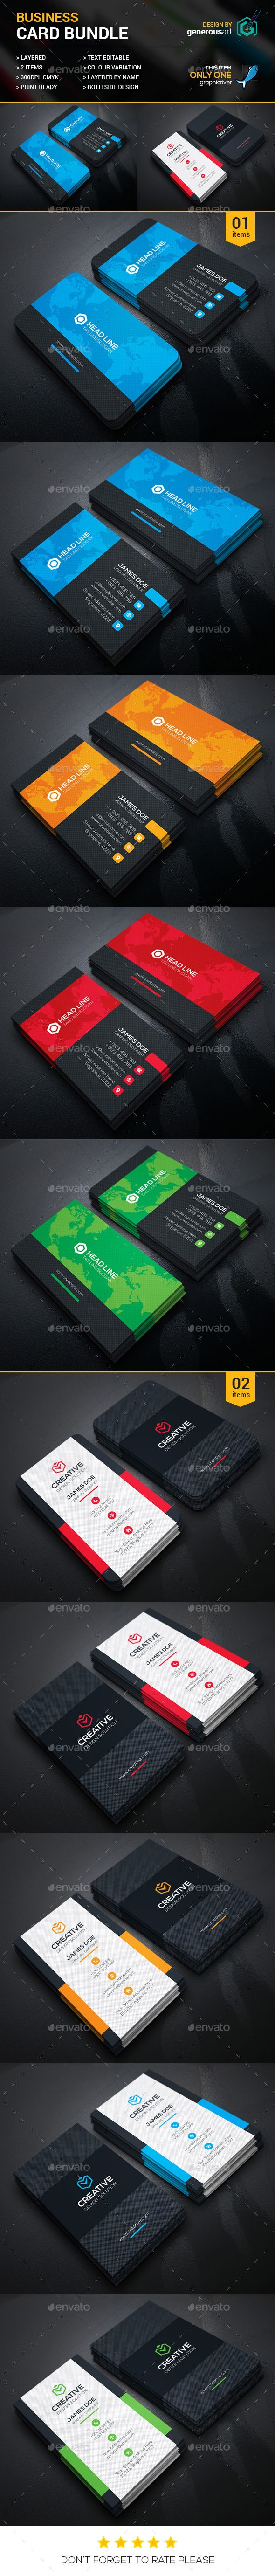 Business Card Bundle 2 in 1 Template PSD #design #visitcard Download: http://graphicriver.net/item/business-card-bundle-2-in-1_vol30/13101520?ref=ksioks